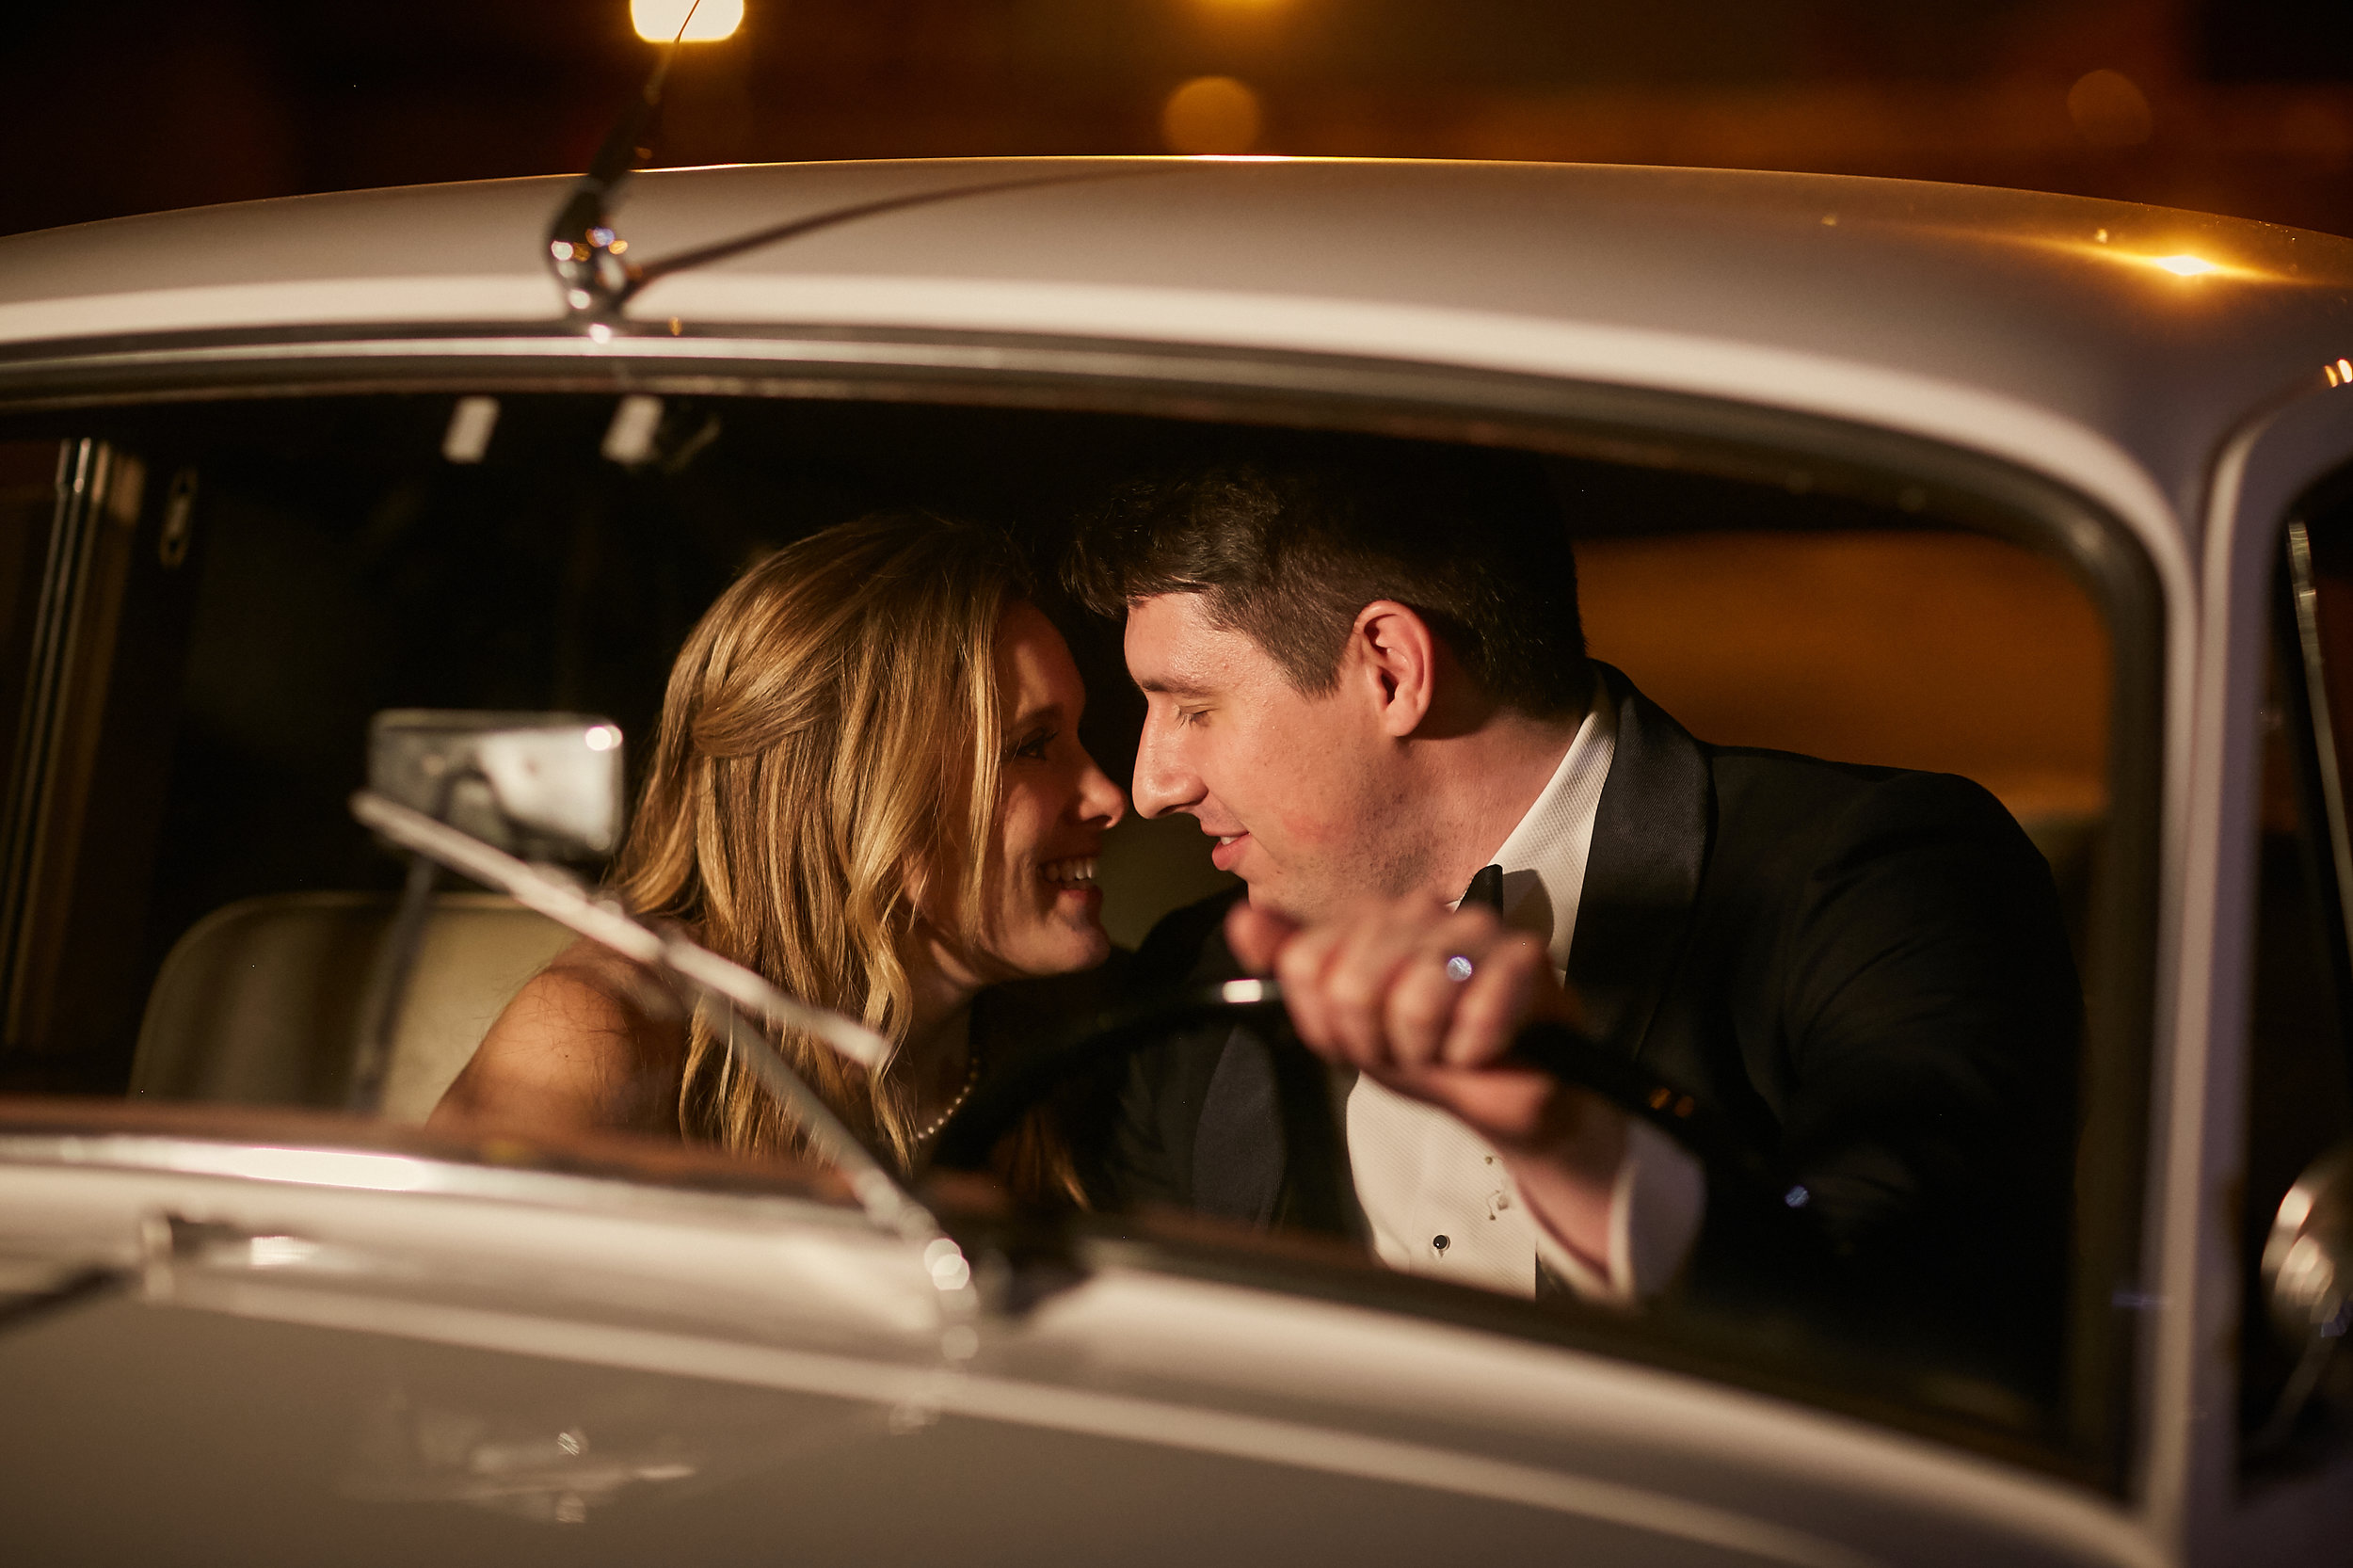 bride groom wedding couple married marriage rolls royce house car sneak peek moment get away car